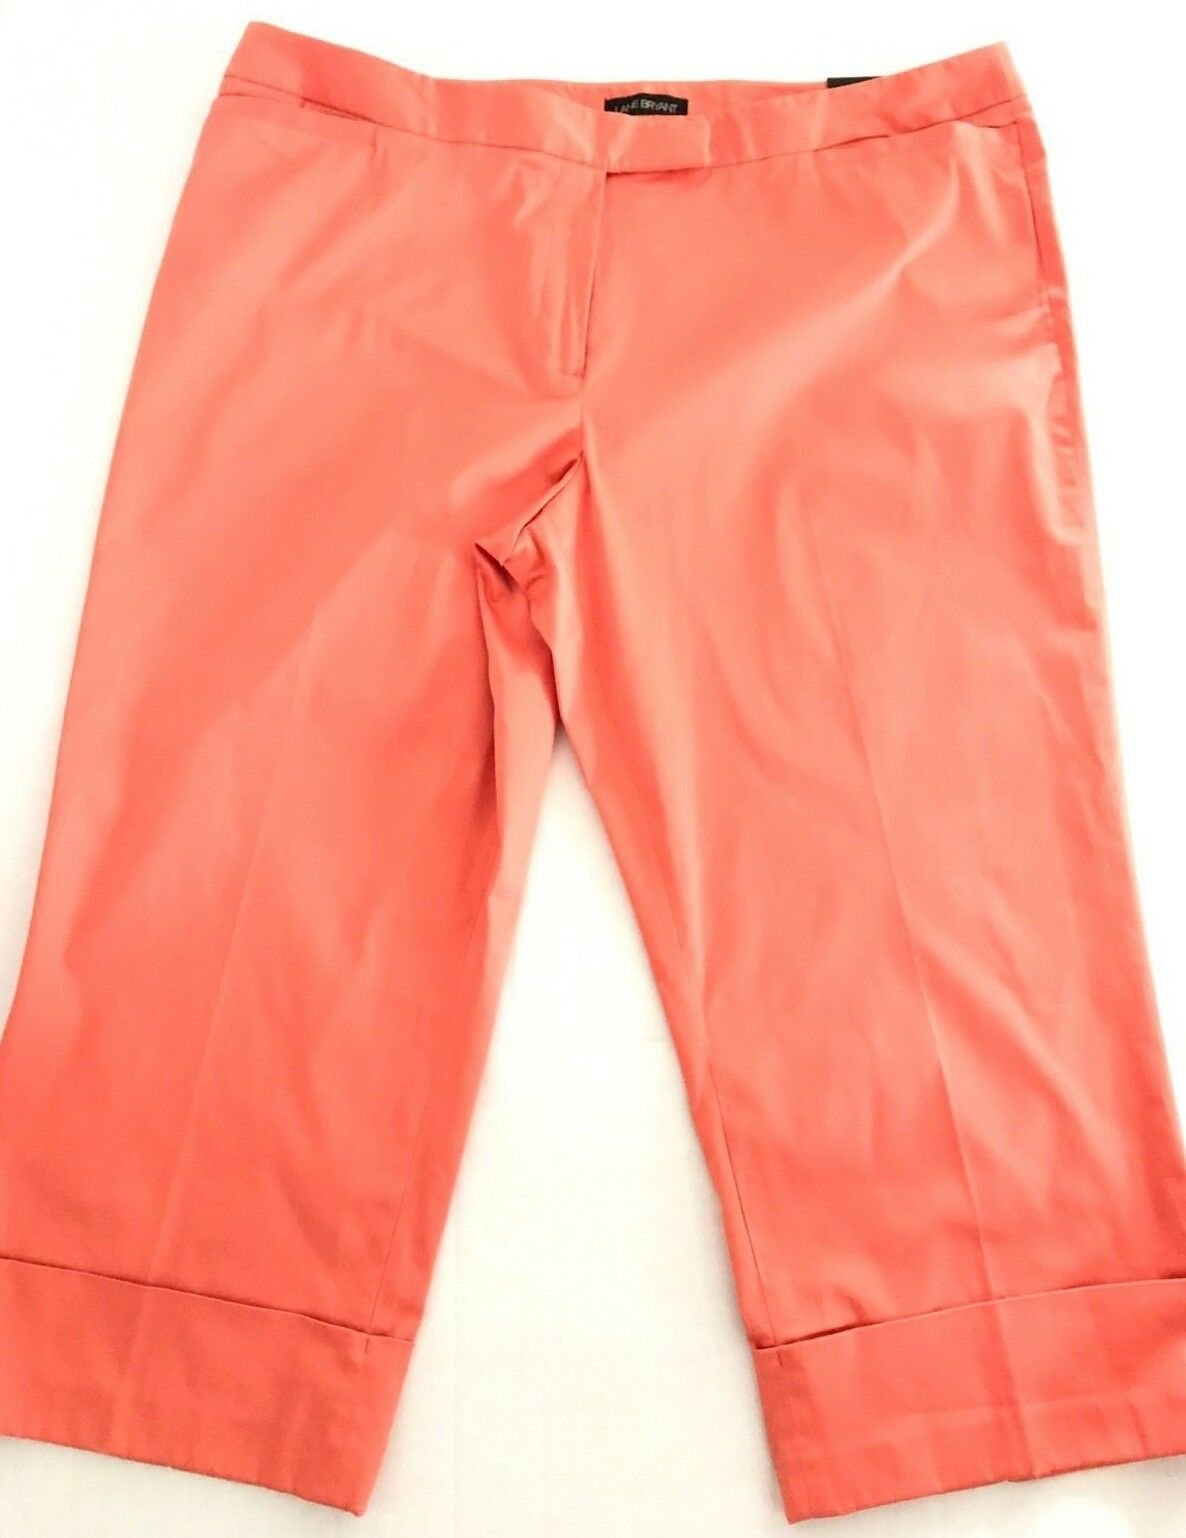 Lane Bryant Pants Wide Lafayette Crop Flared Leg Capri Size 26 orange NEW